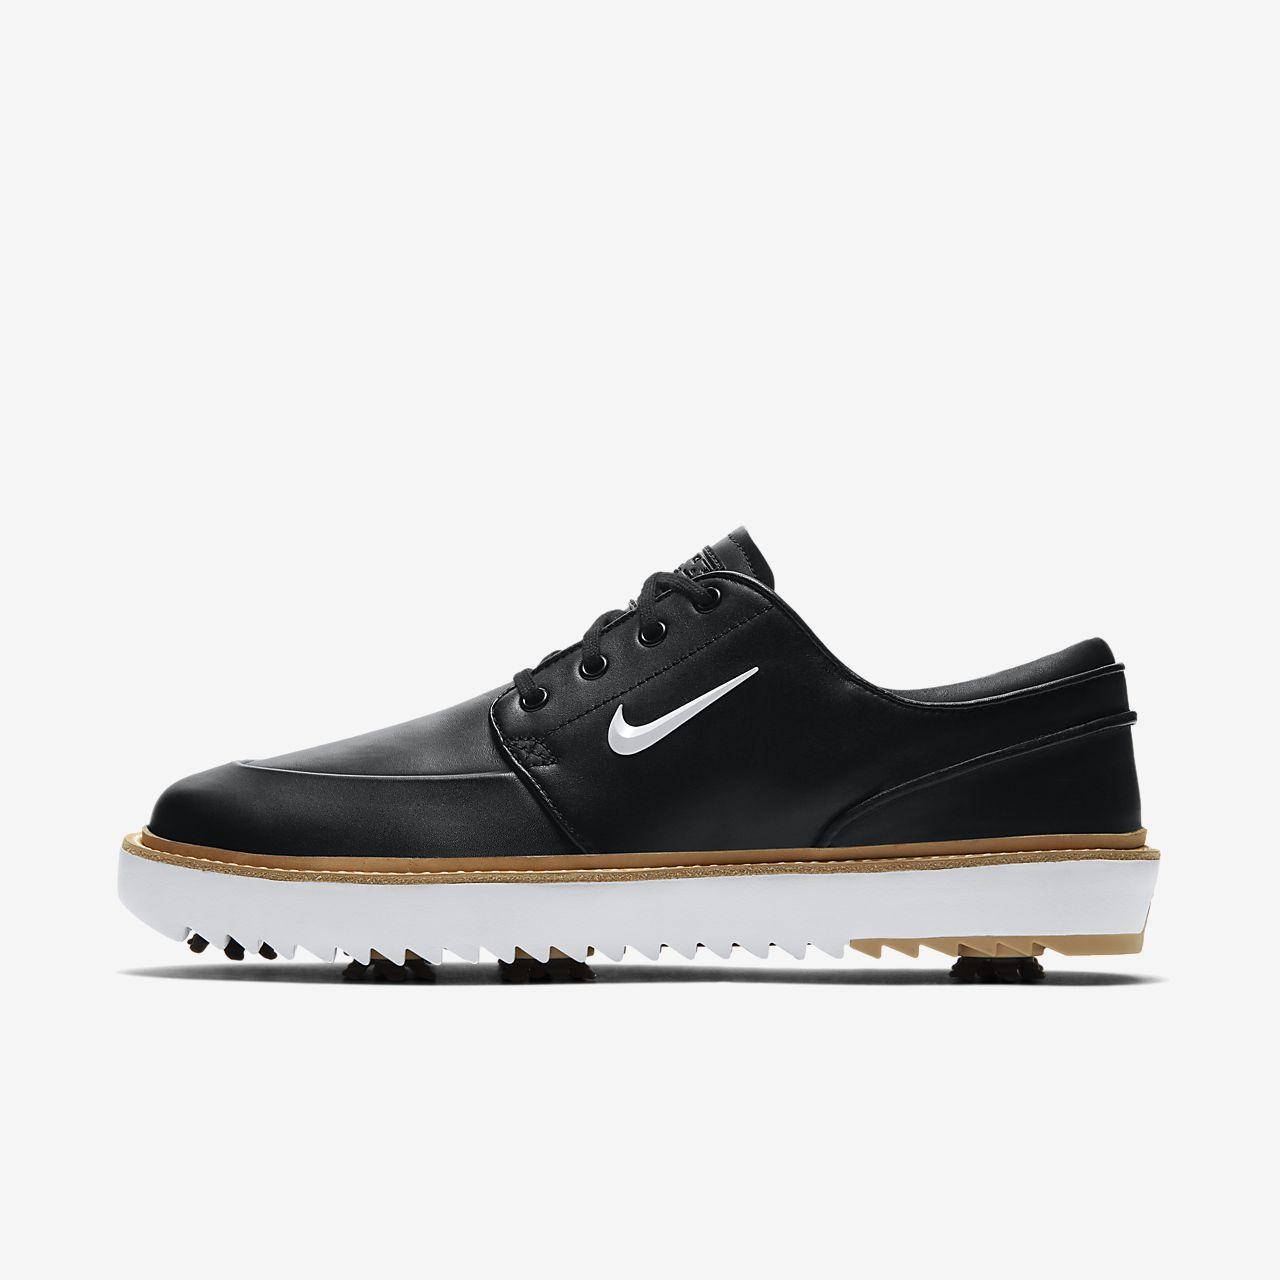 Nike Janoski G Tour Herren-Golfschuh